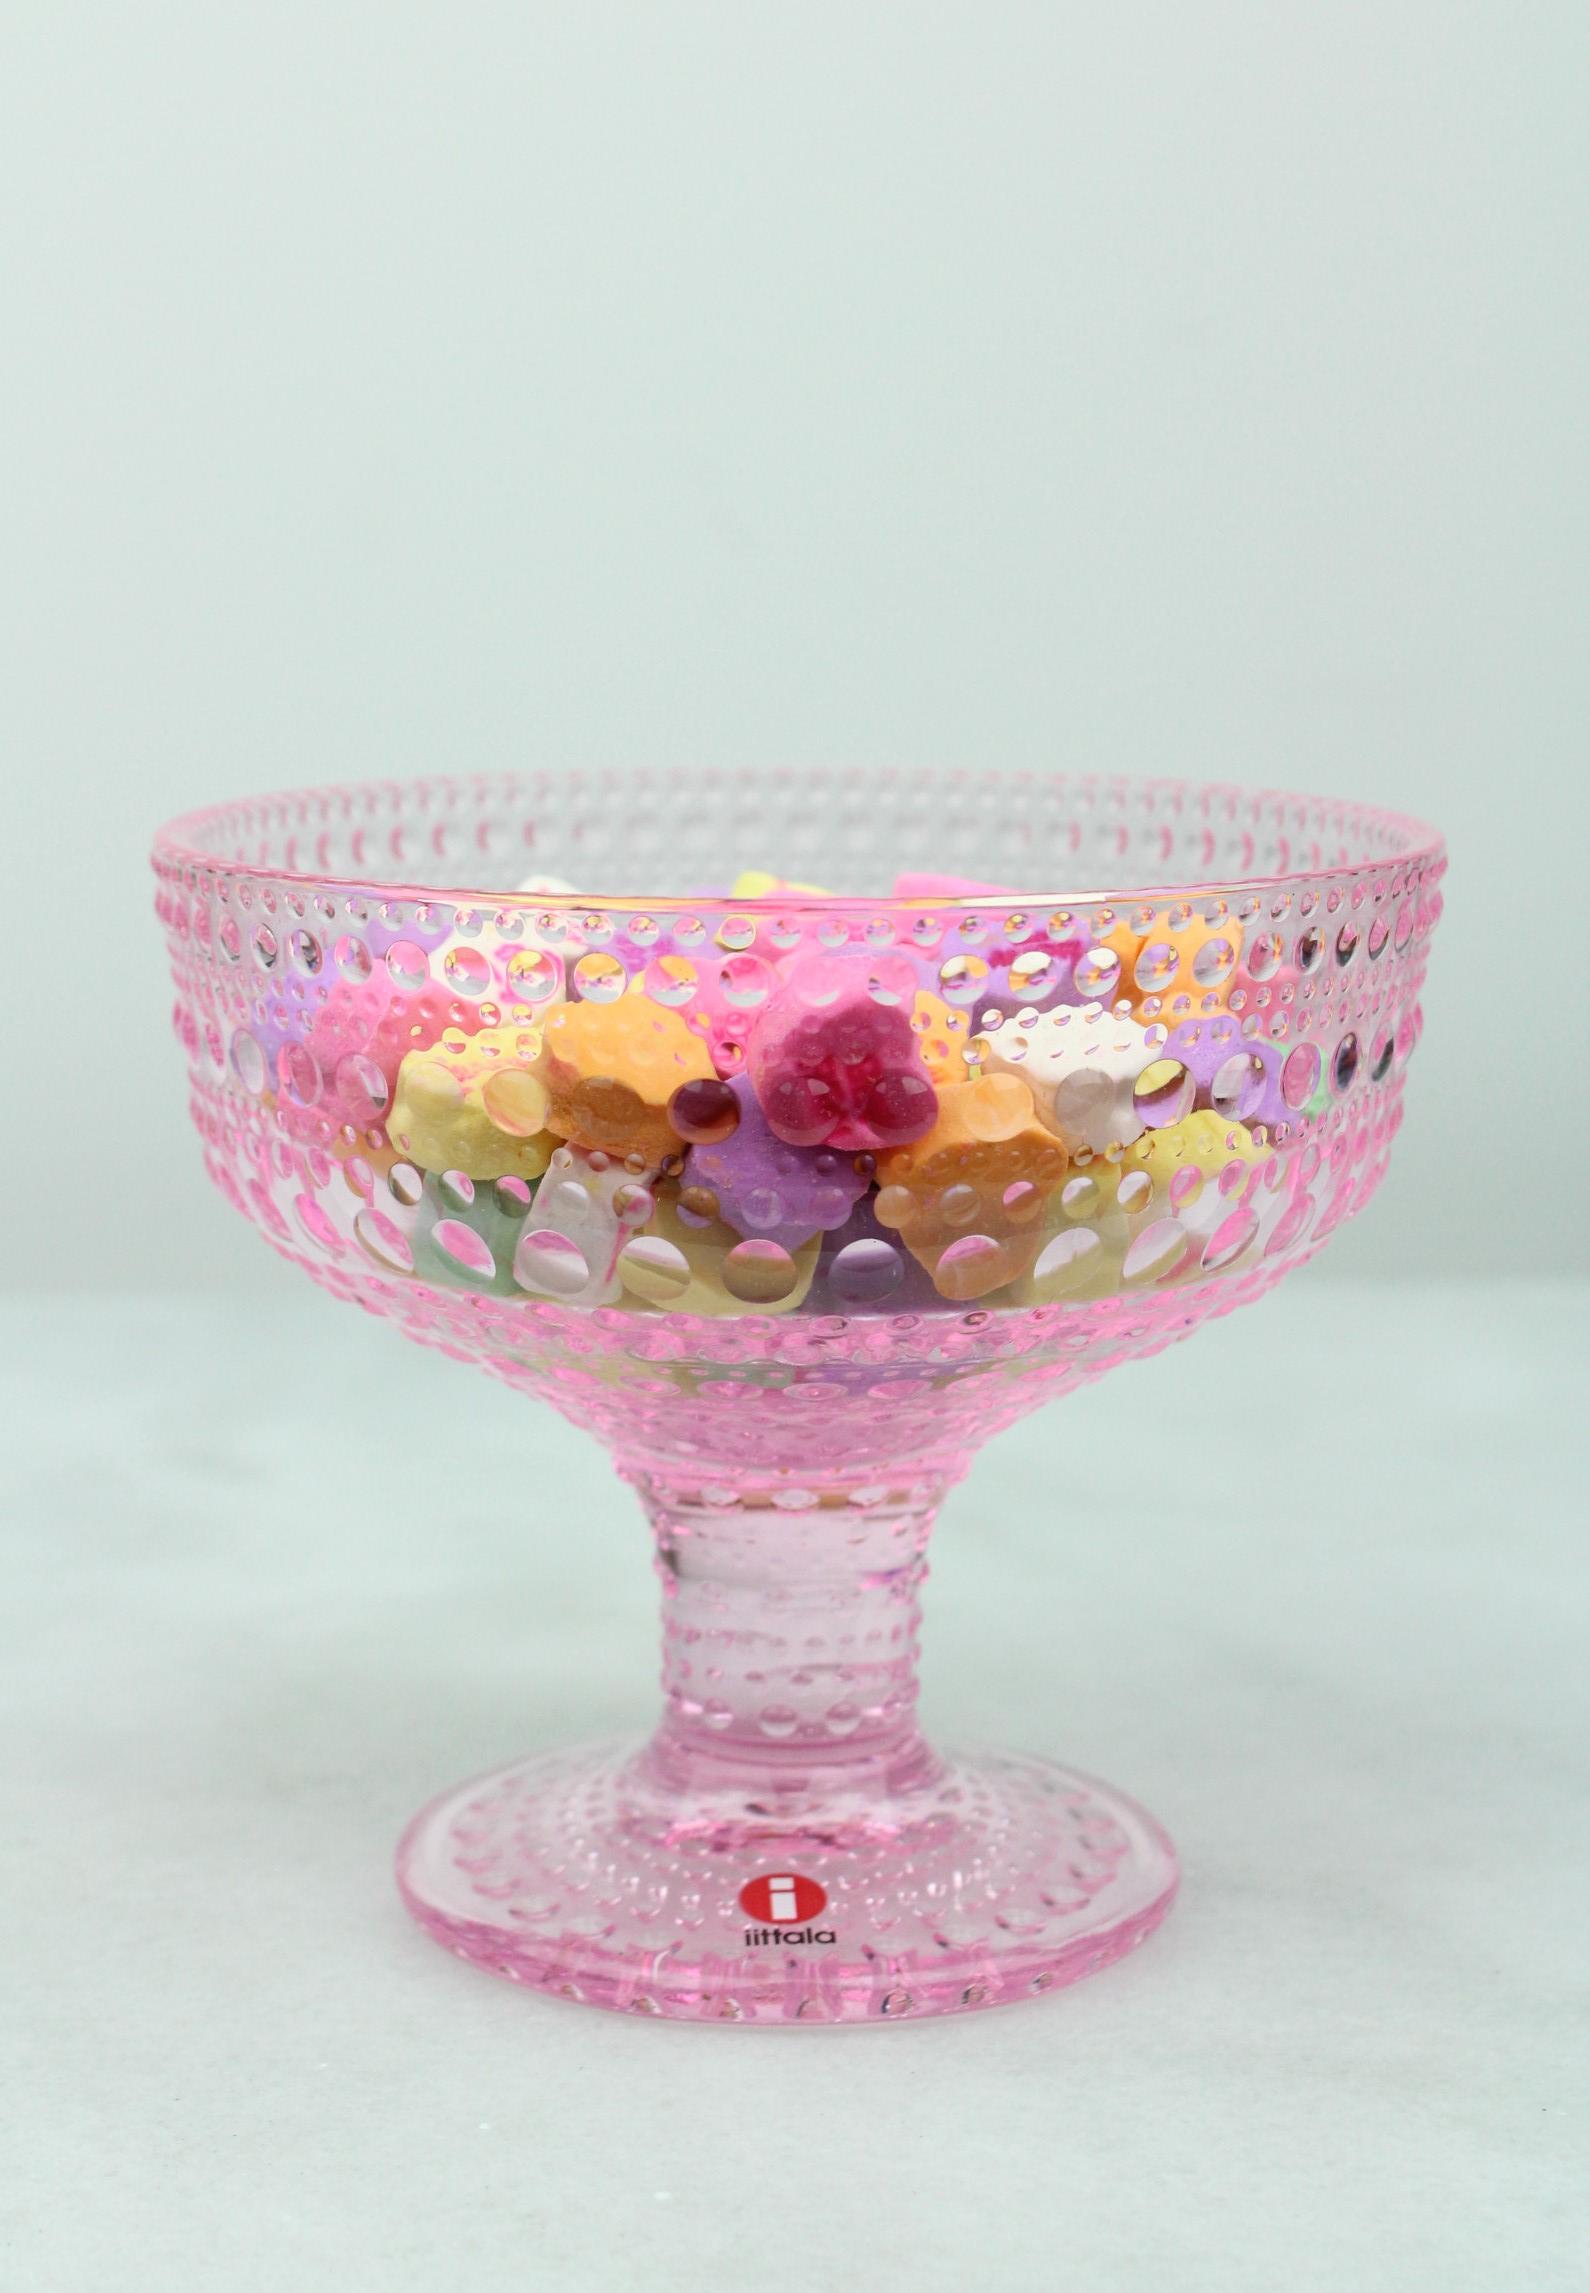 iittala Kastehelmi Dewdrop Footed Bowl in Pale Pink